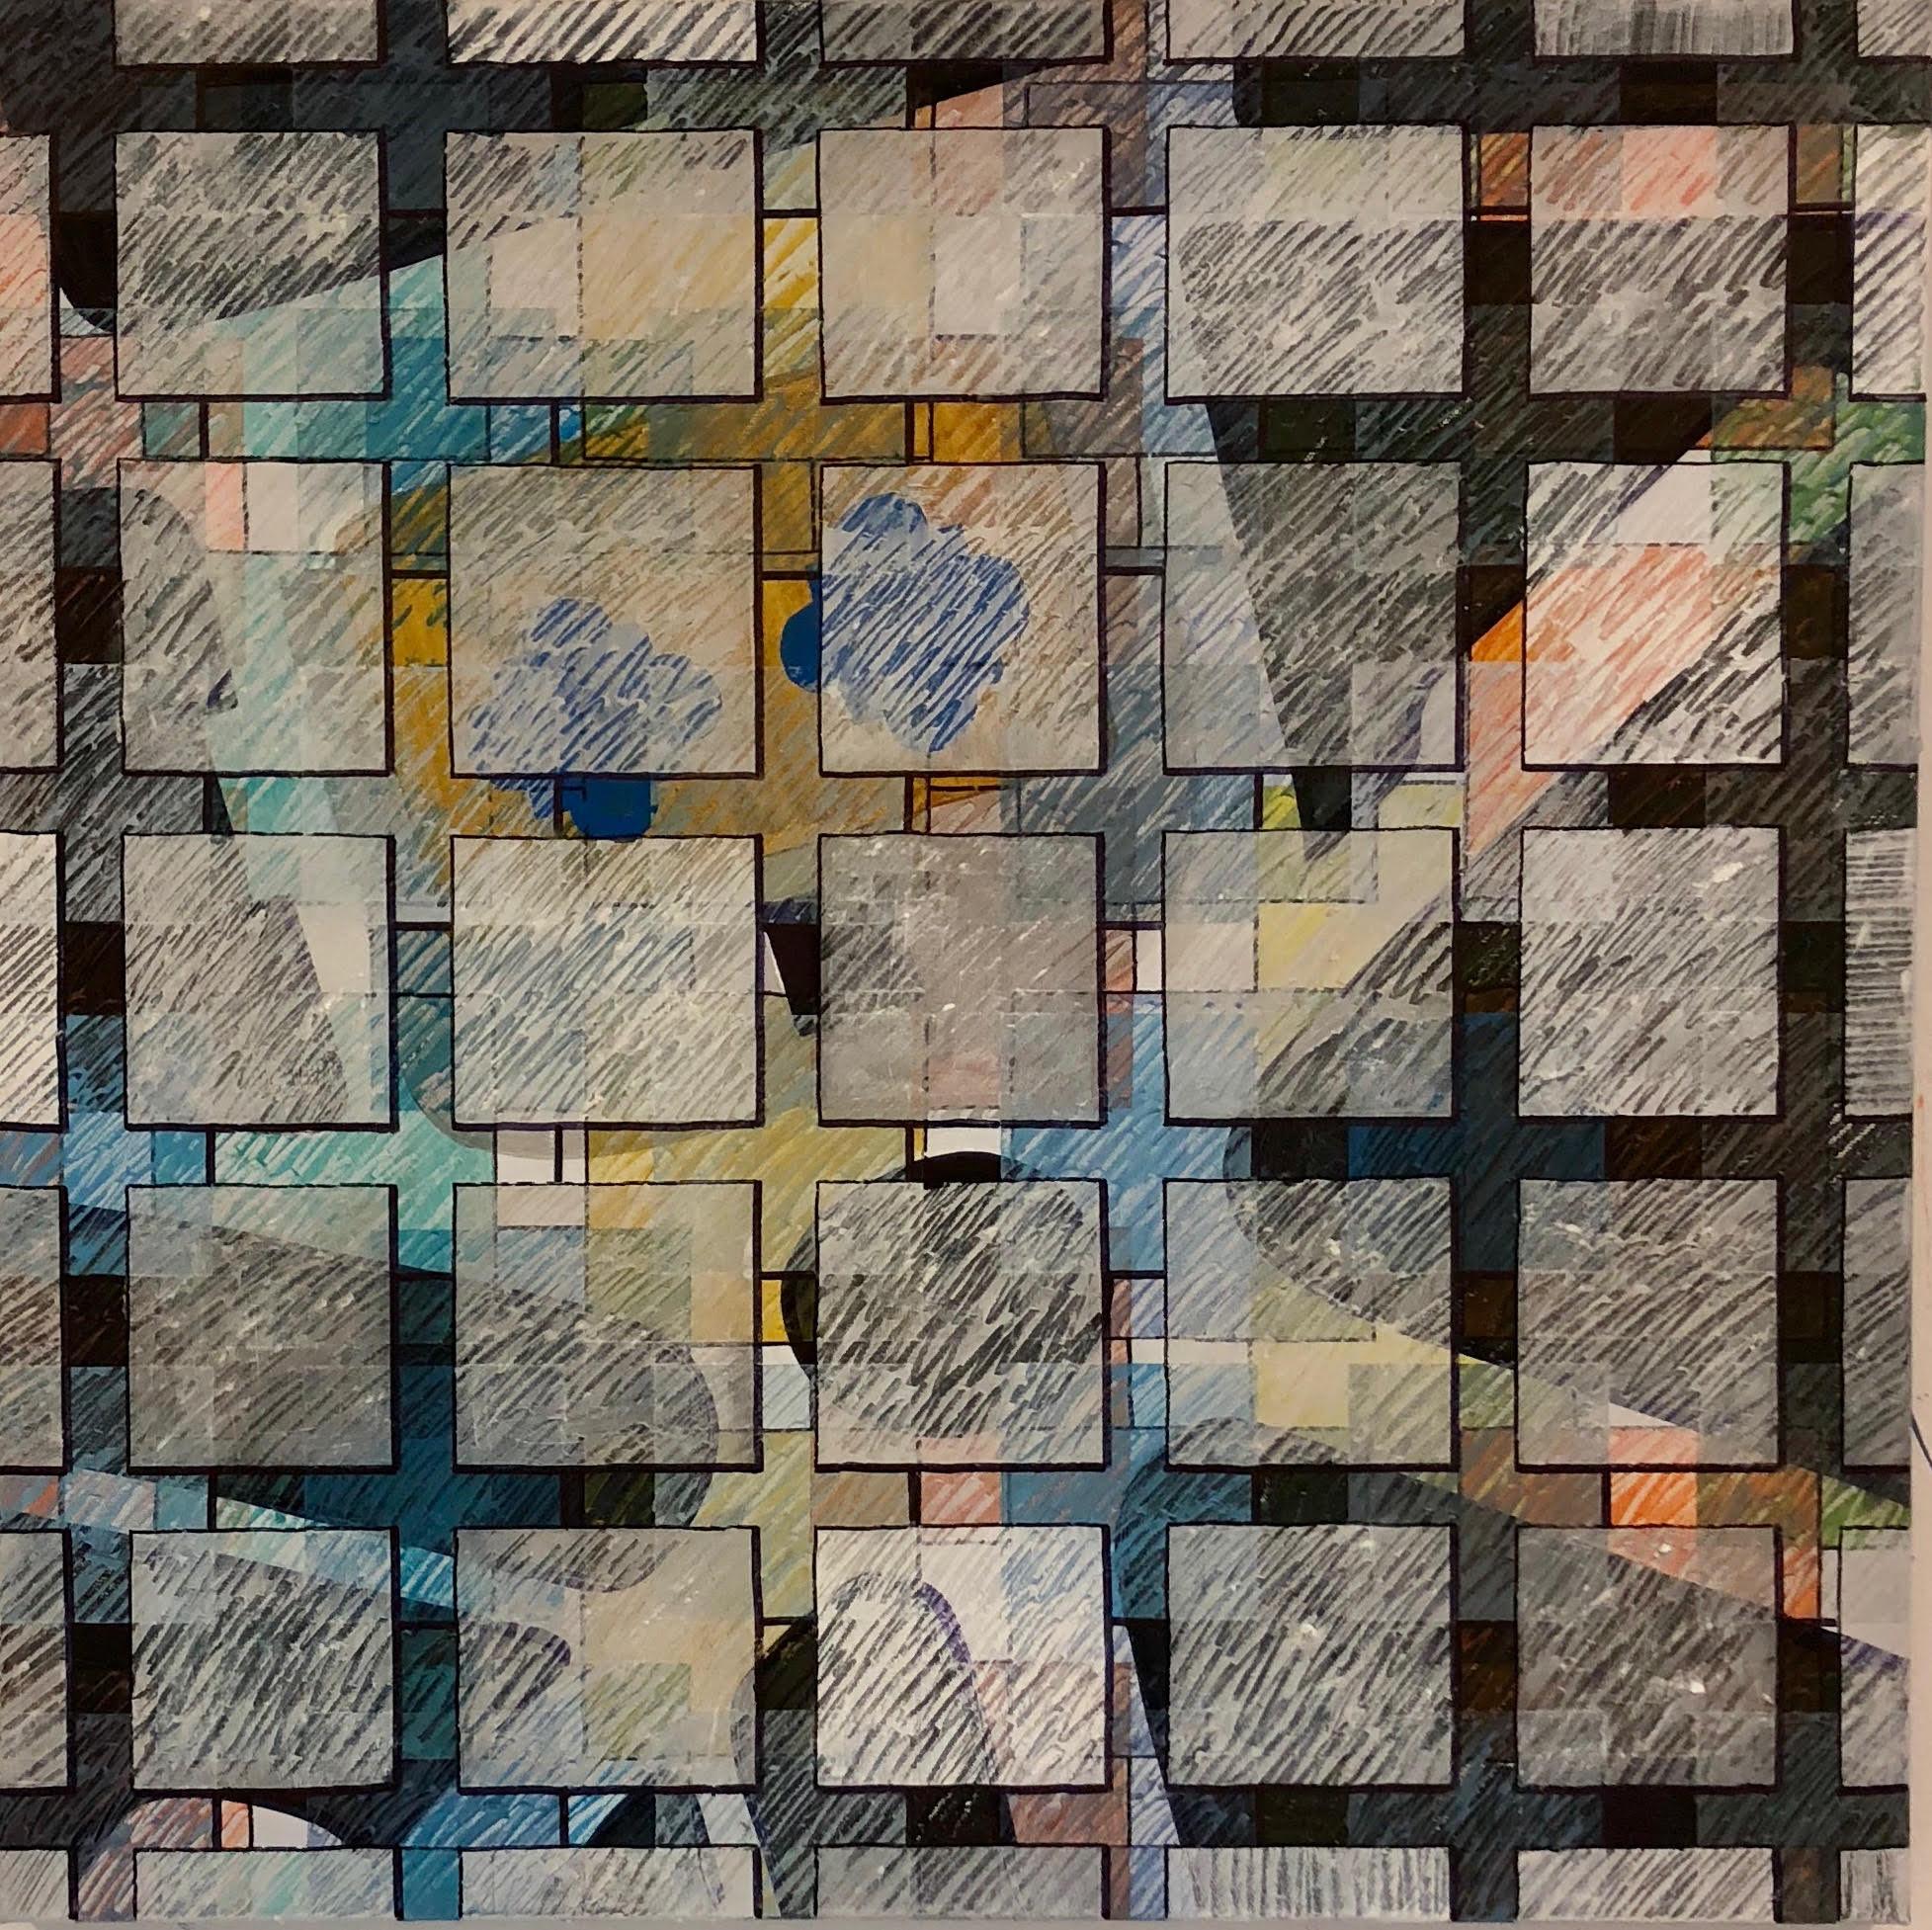 Trafalgar Square, 2018 | Mixed Media on Canvas | 80 x 80 cm | £750 (framed)